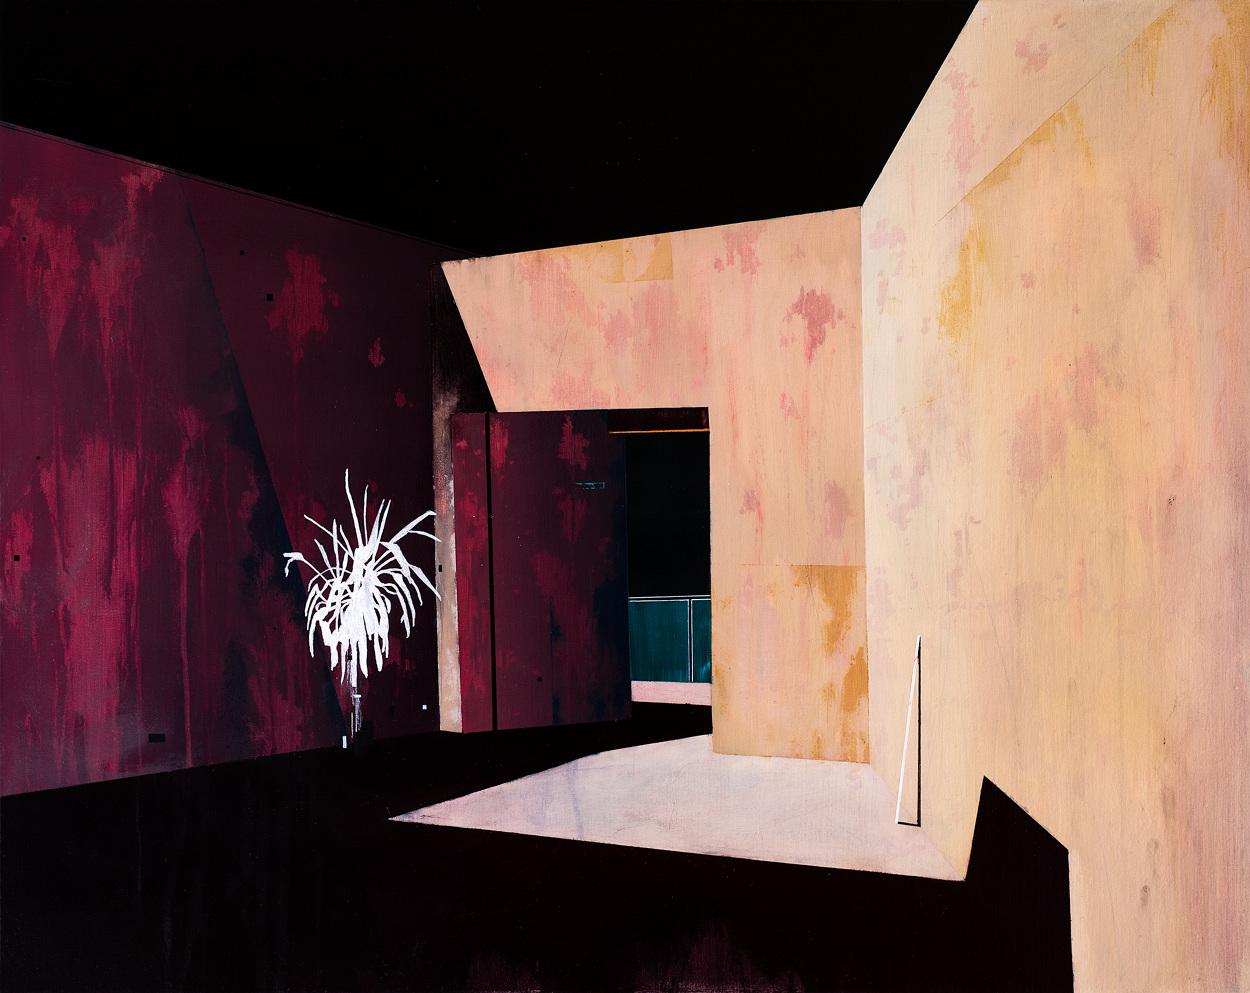 Courtyard-Shadow--100x80cm--mixed-media-on-canvas--2016_1250.jpg